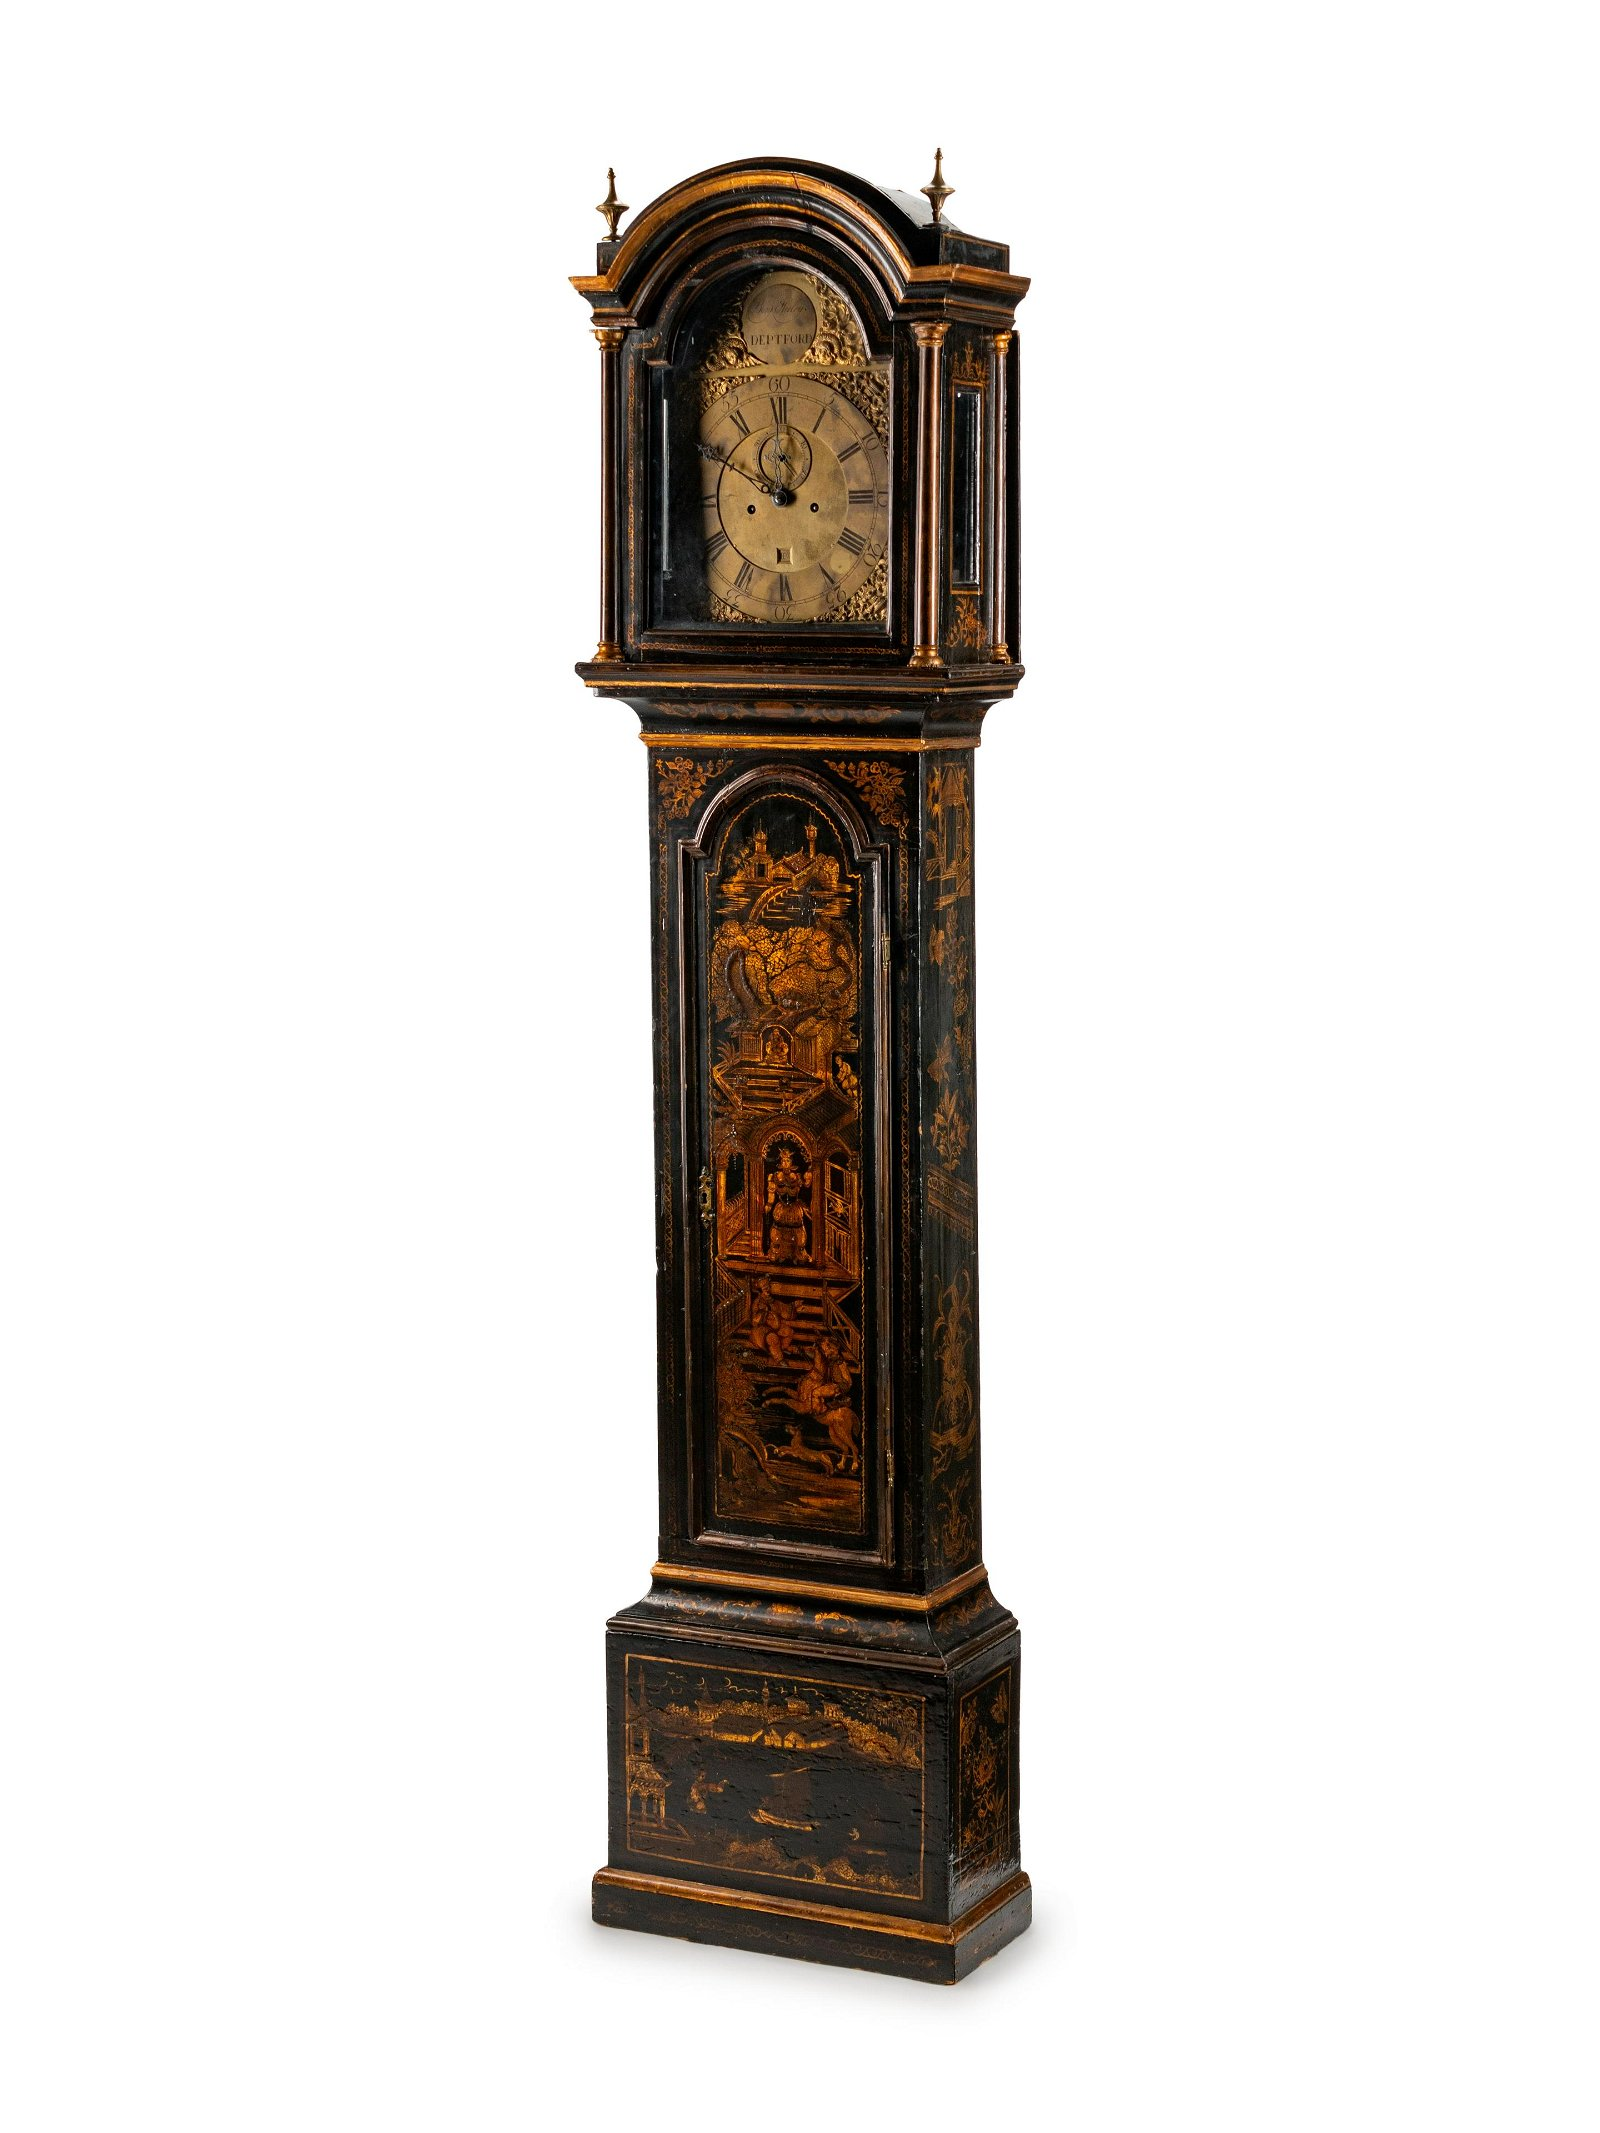 A George III Black-Japanned Longcase Clock Height 85 x